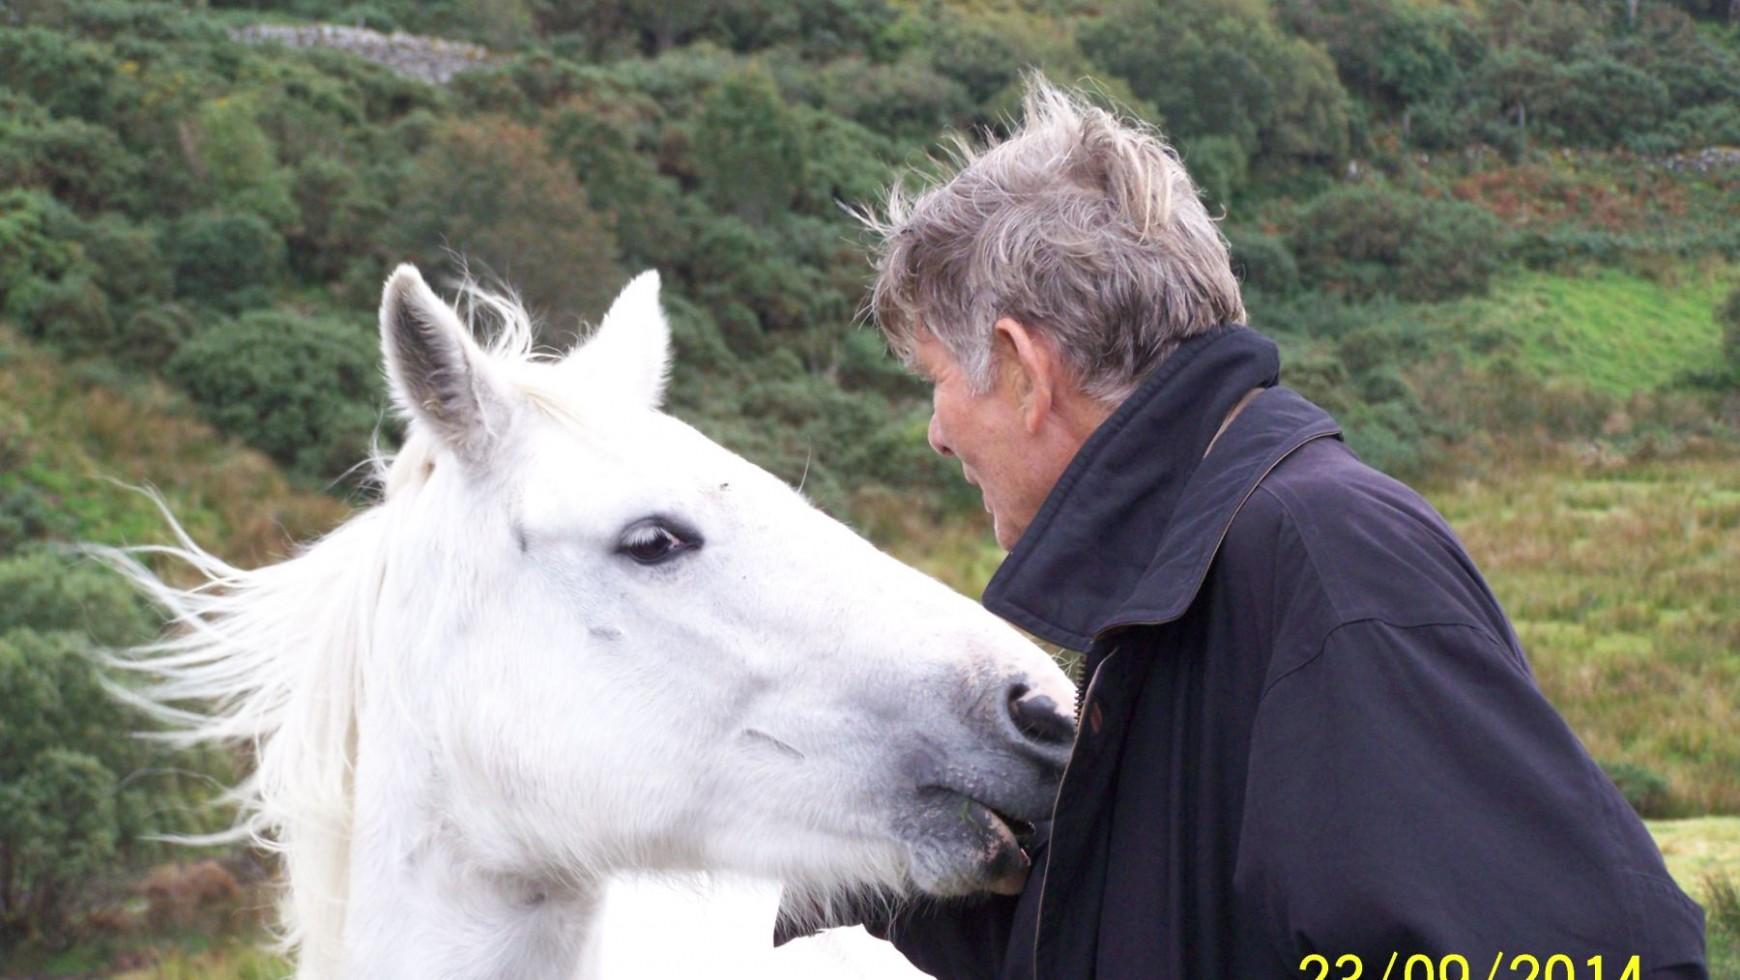 Relational Horsemanship